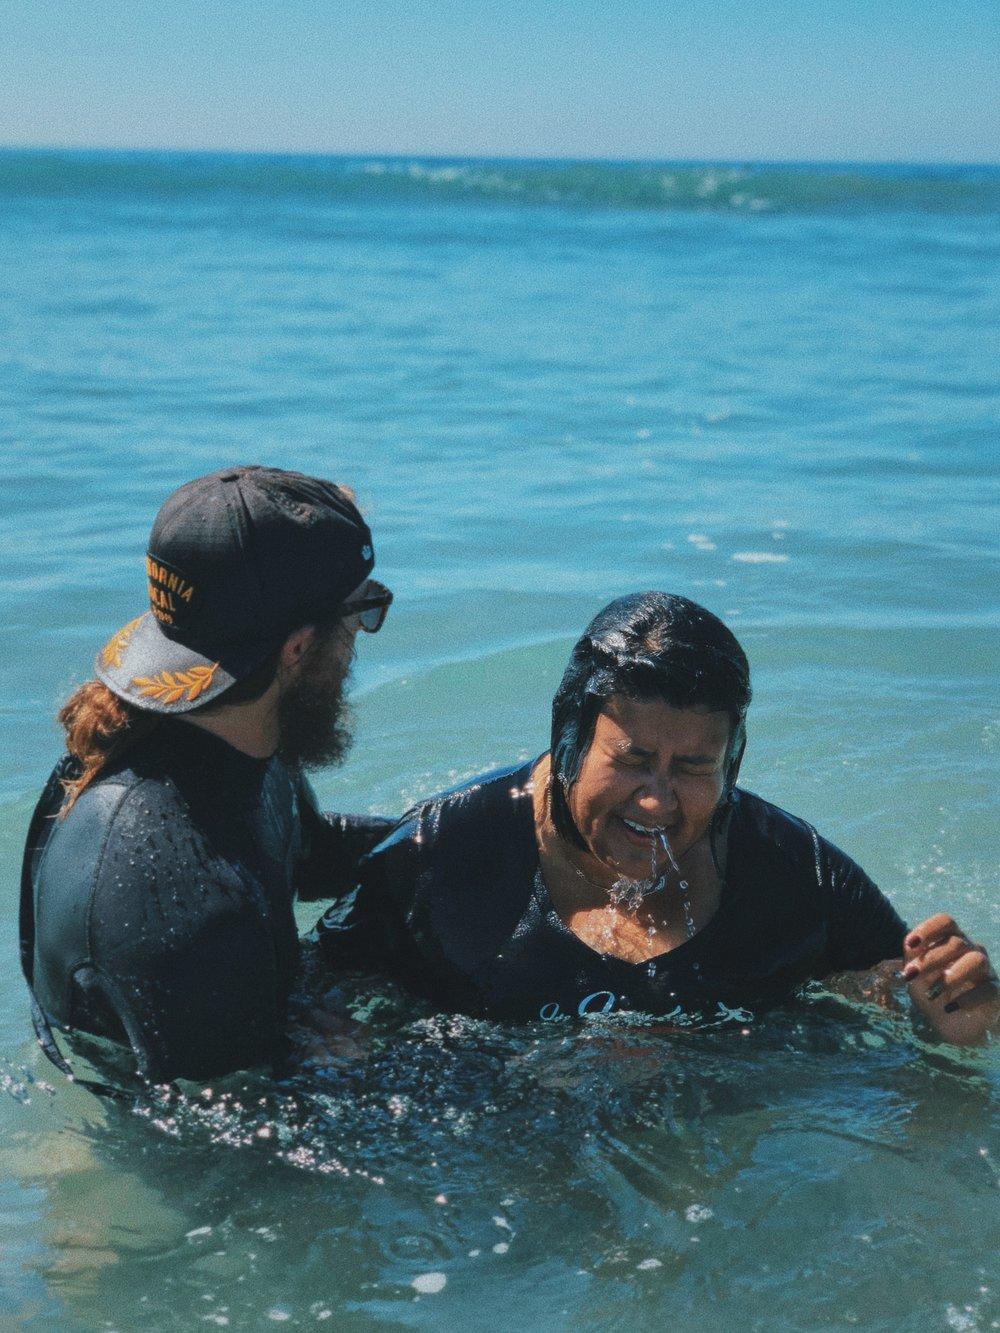 malibu-beach-baptism-mission-hills-christian-church-4.jpg